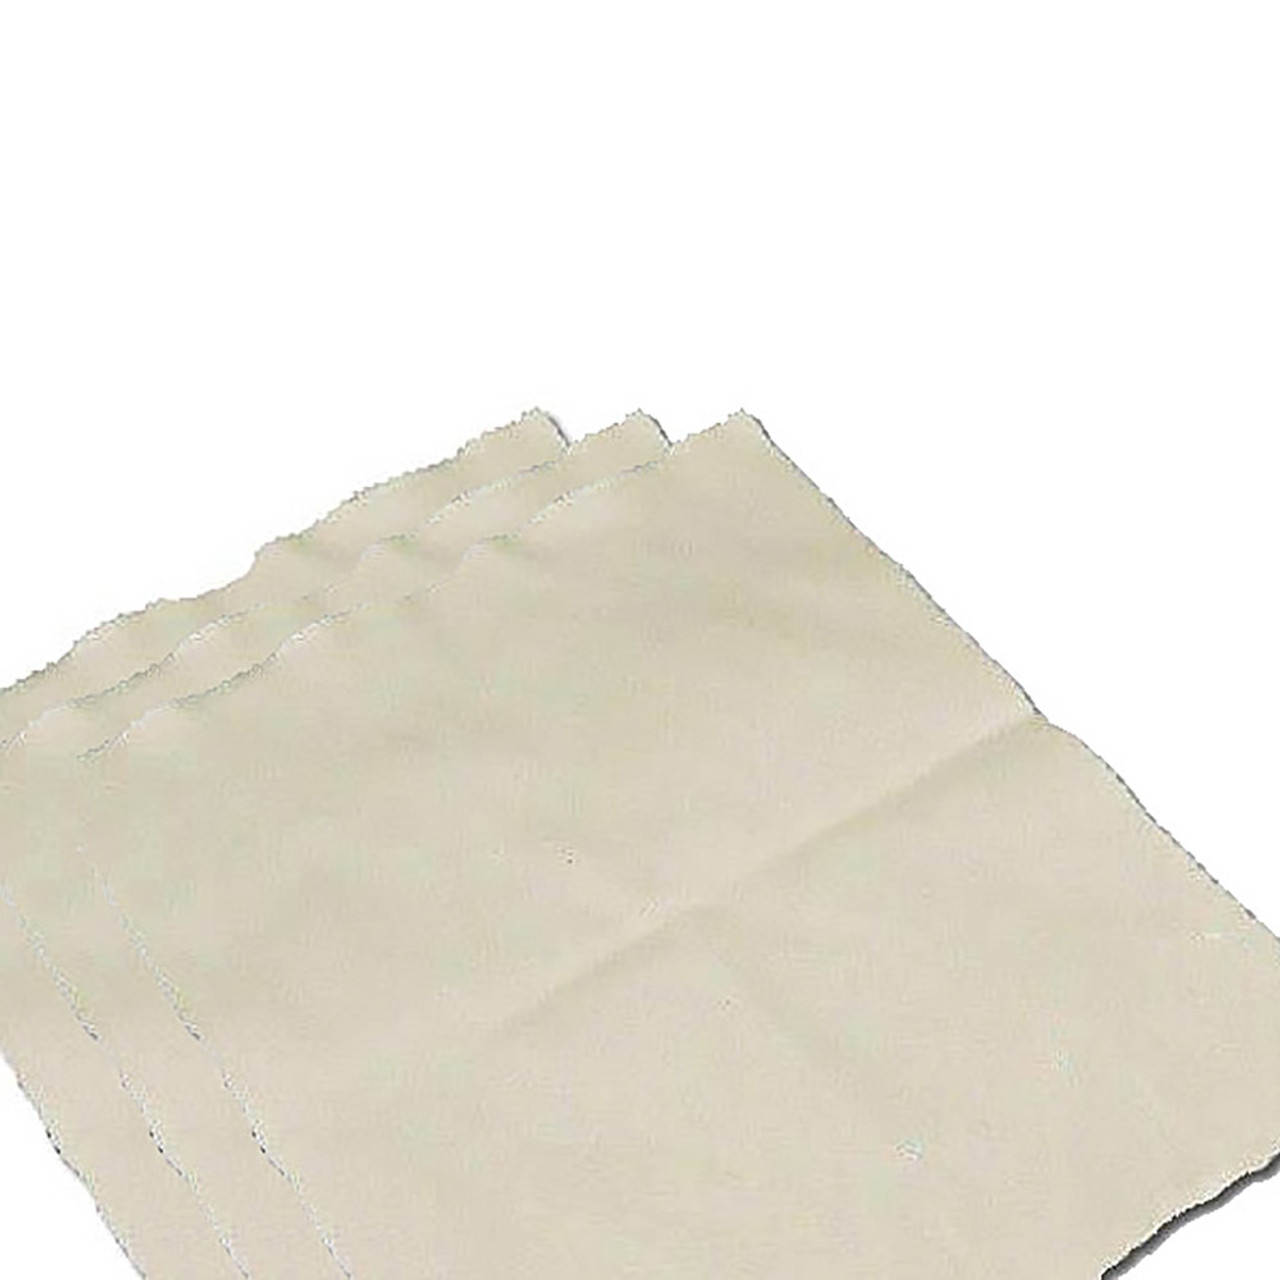 Moistening Cloth Felts x3 - NEOPOST / QUADIENT FP Folder Inserter DS-62, FPi 2000, SI-62, DS-70, DS-63